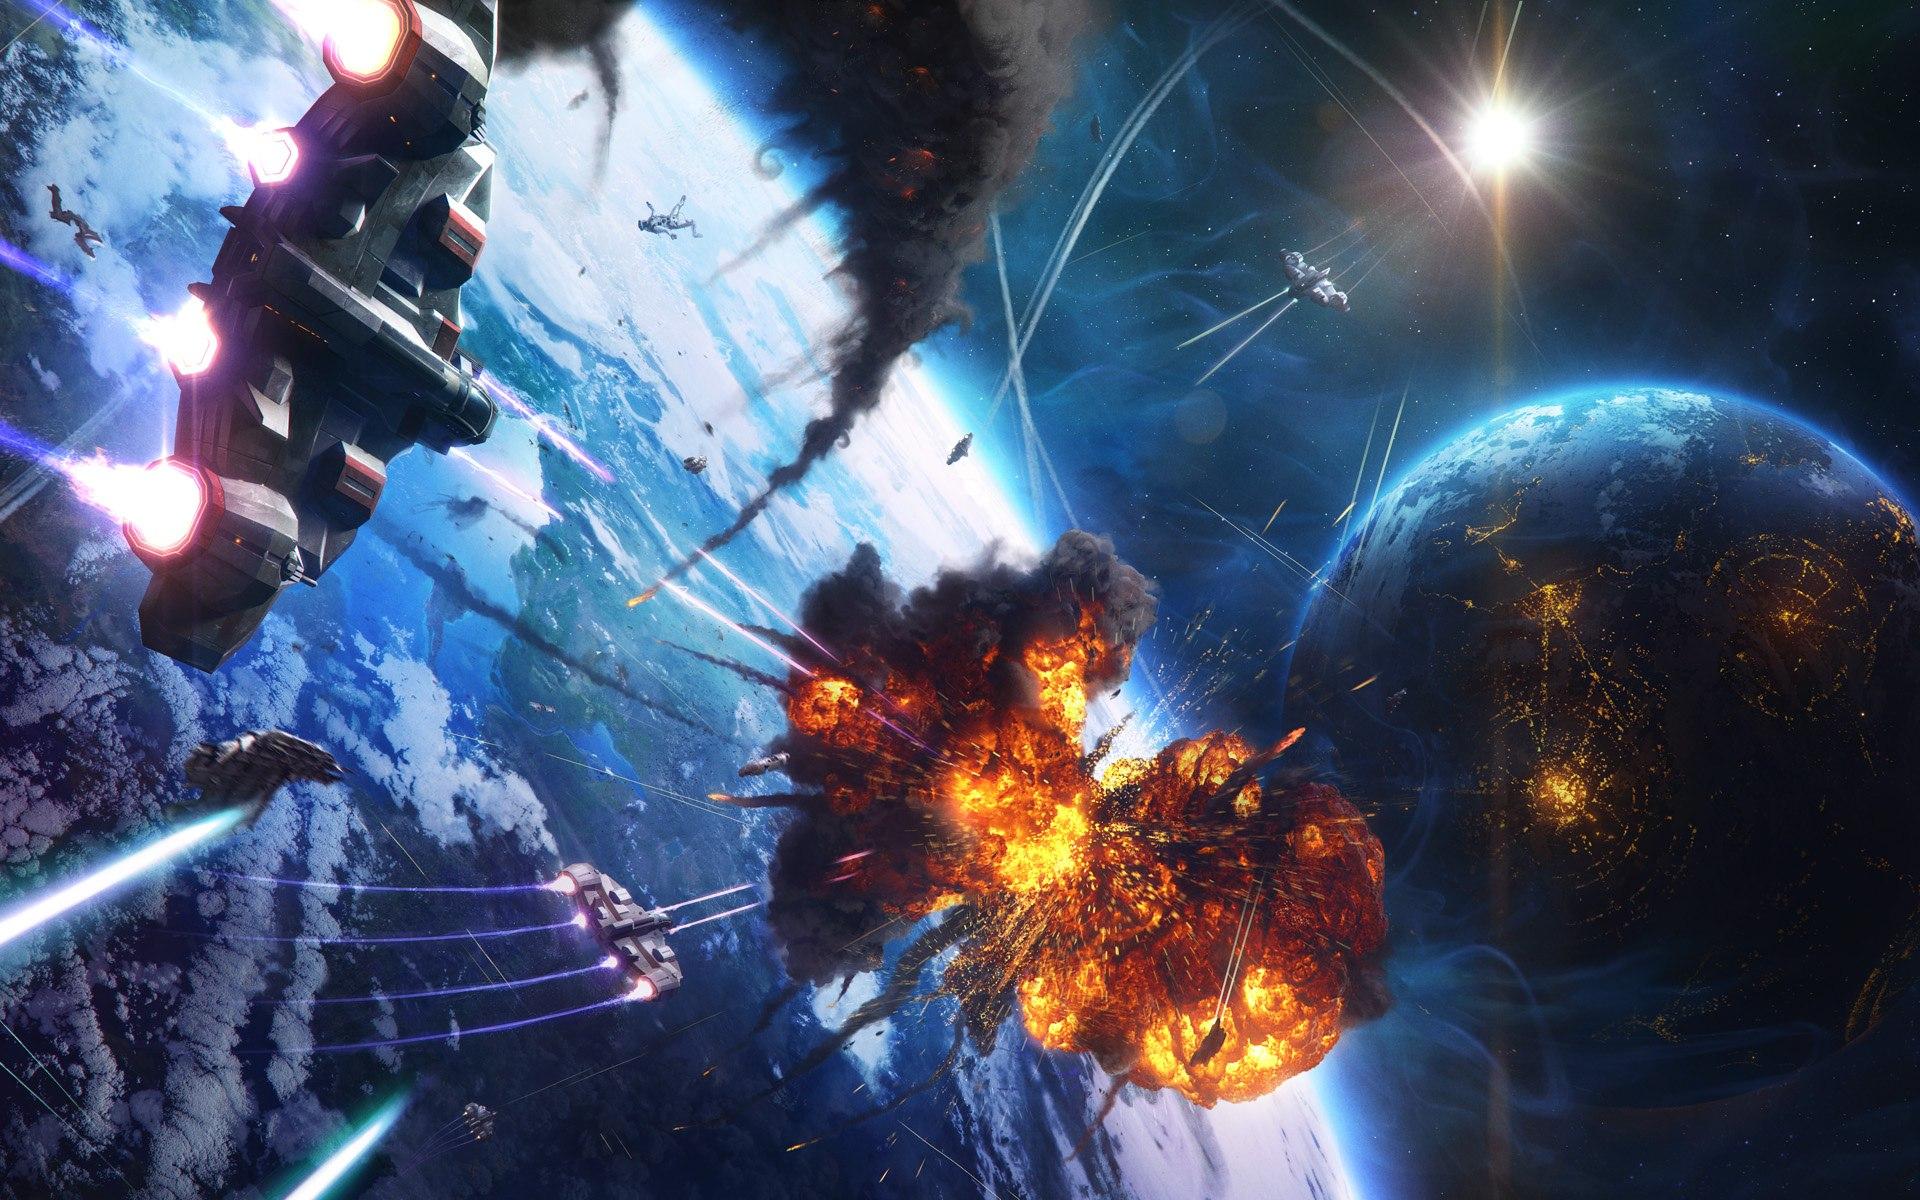 Amazing Sci Fi Space Battle Wallpaper HD 19 High Resolution Wallpaper ...